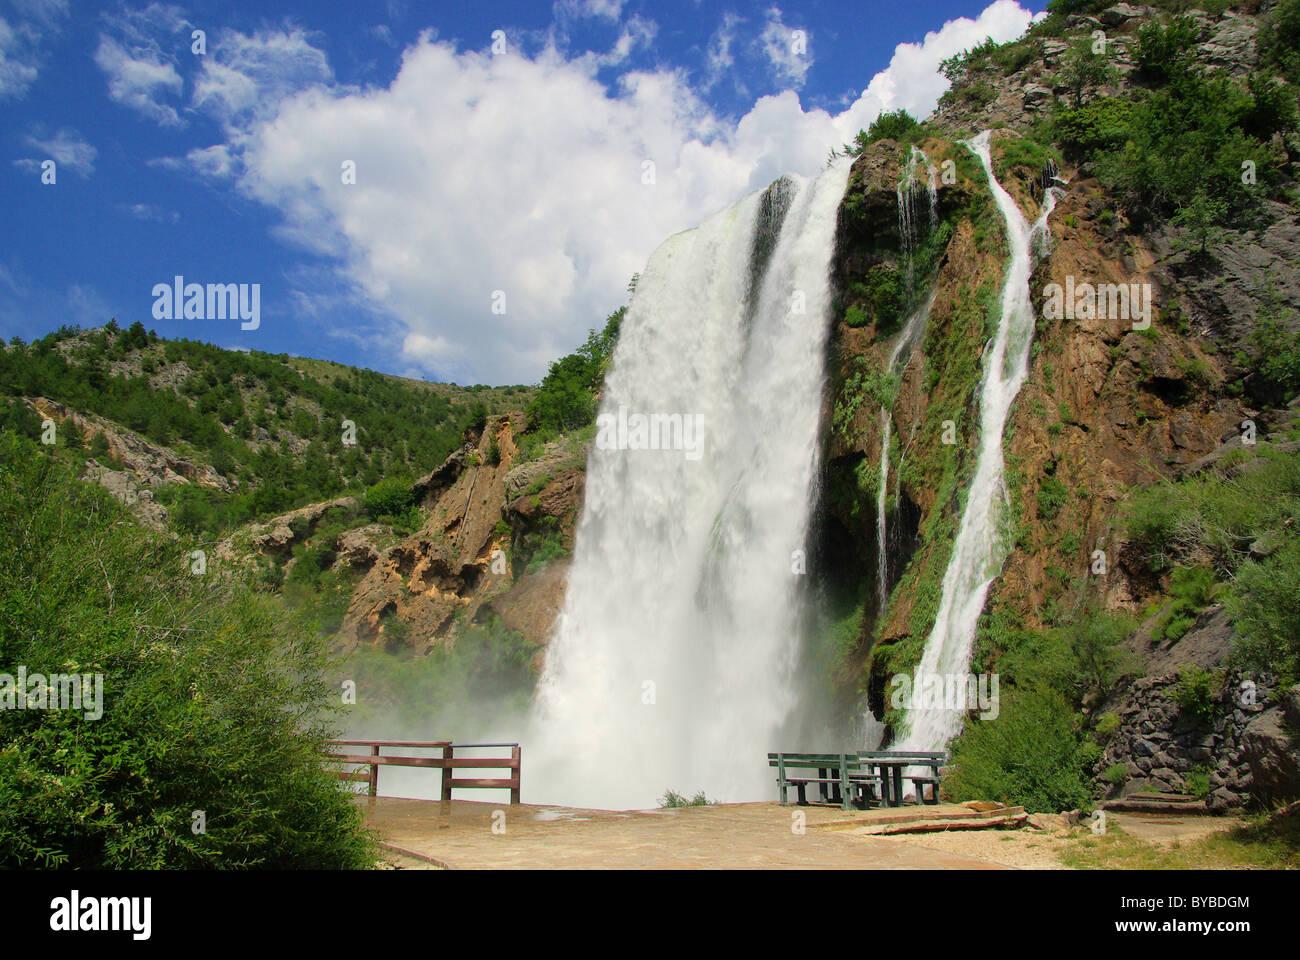 Krcic Wasserfälle - Wasserfall Krcic 05 Stockbild